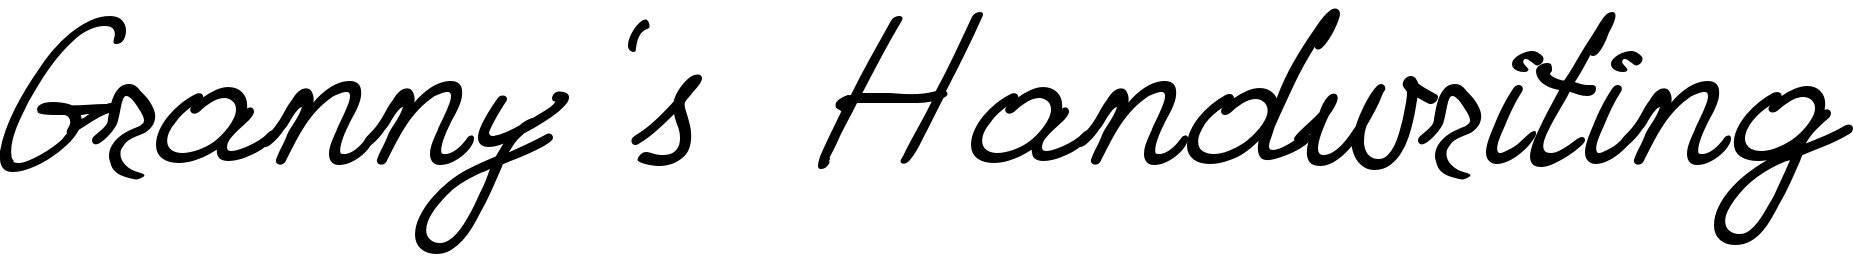 Granny's Handwriting